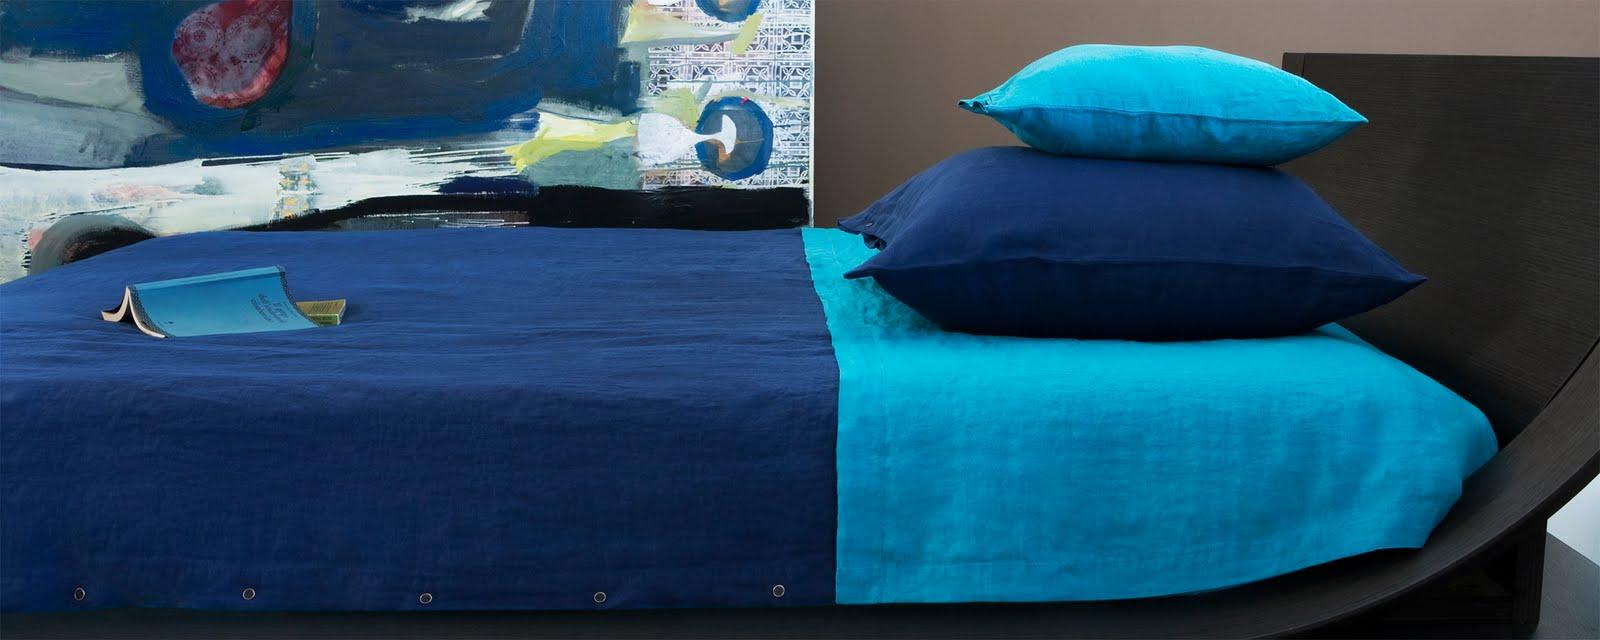 blog bazar housse de couette boutons pression. Black Bedroom Furniture Sets. Home Design Ideas